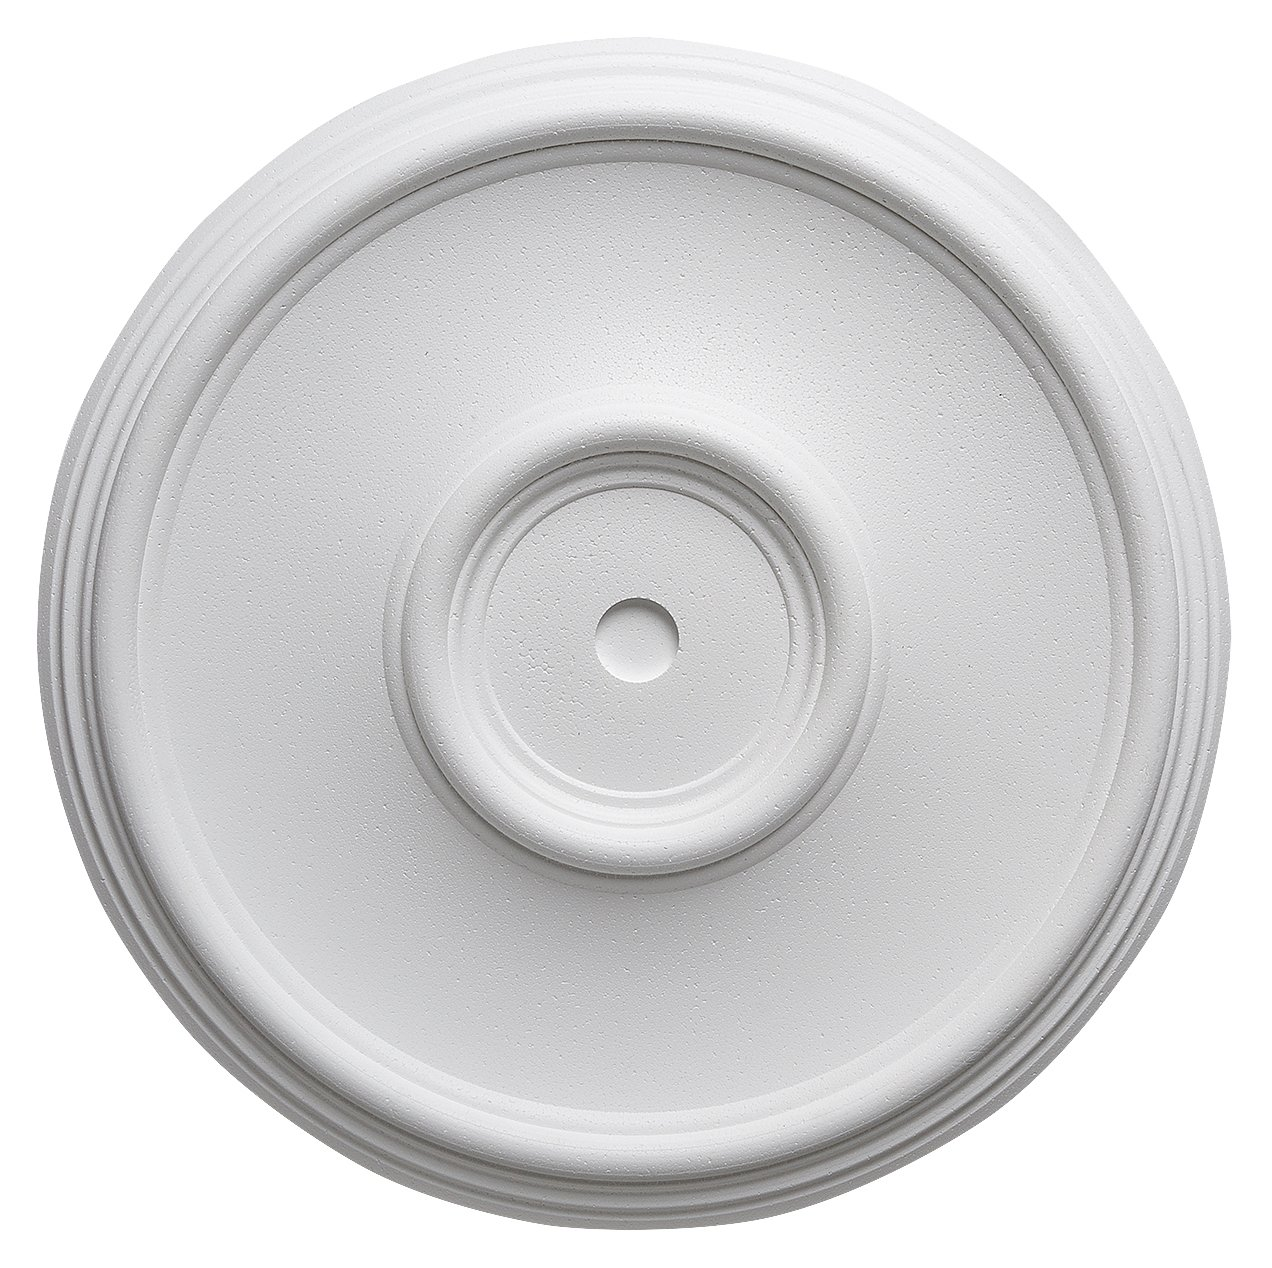 4 St/ück /à /Ø 35 cm individualisierbare Deckenrosette wei/ß DECOSA Rosette Elsa Stuckrosette aus Styropor